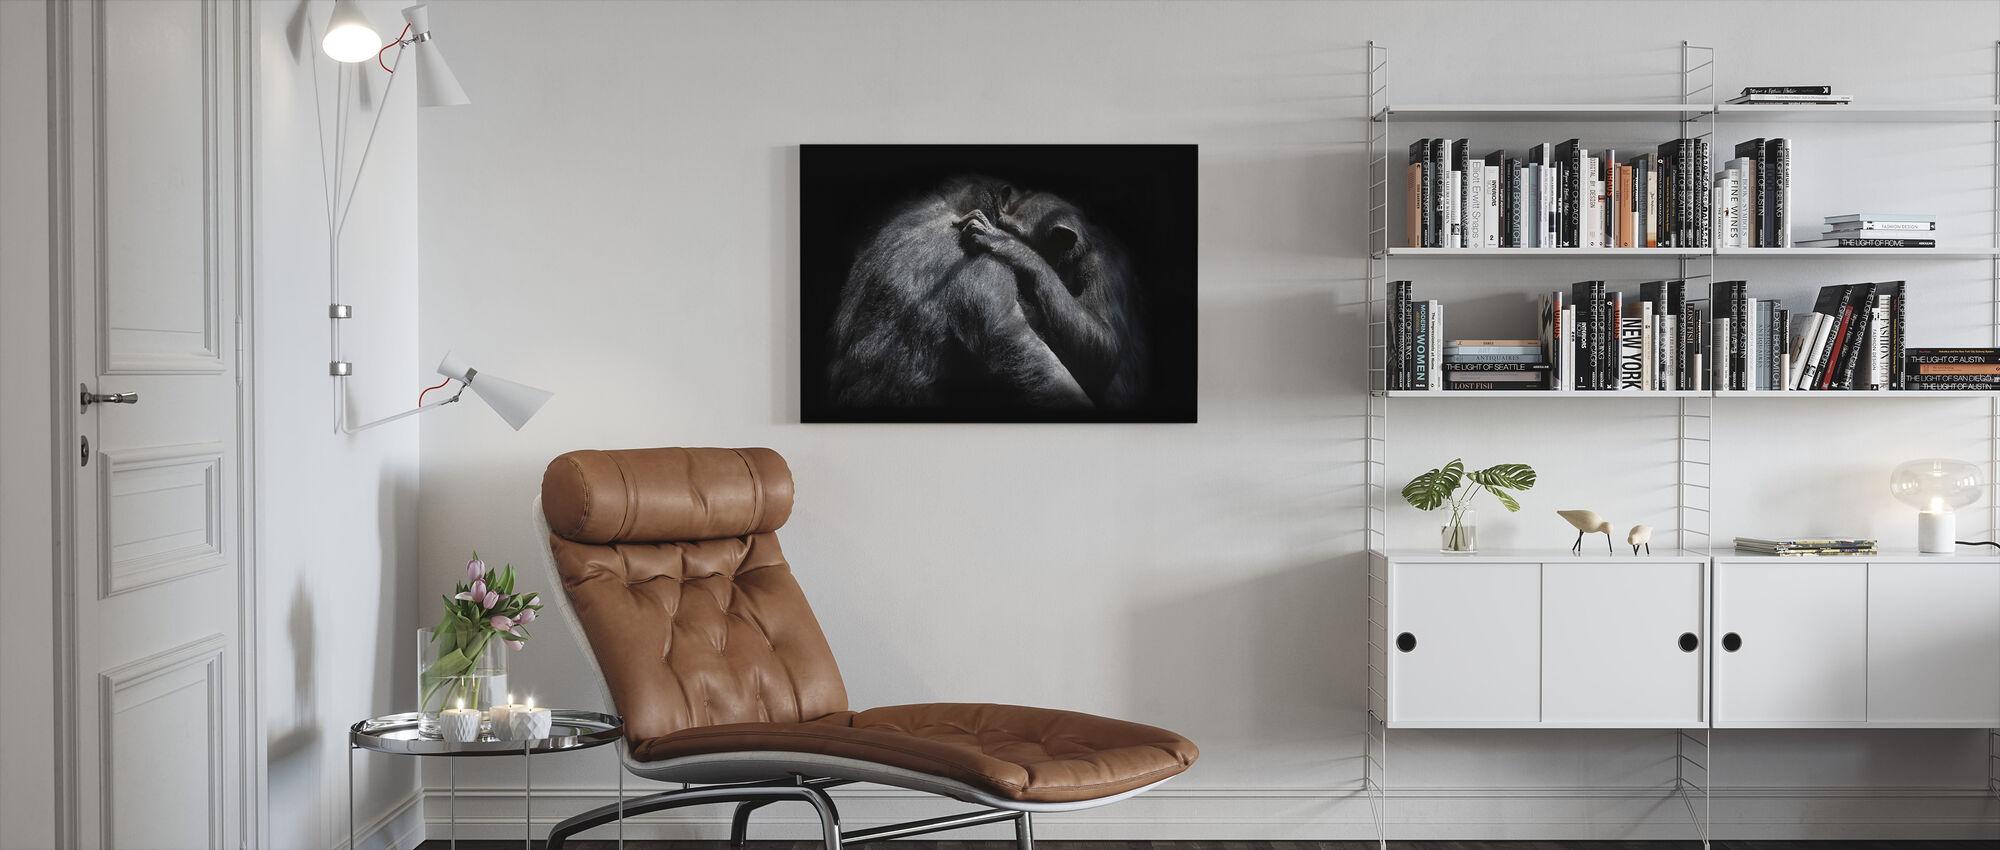 Embrace - Canvas print - Living Room